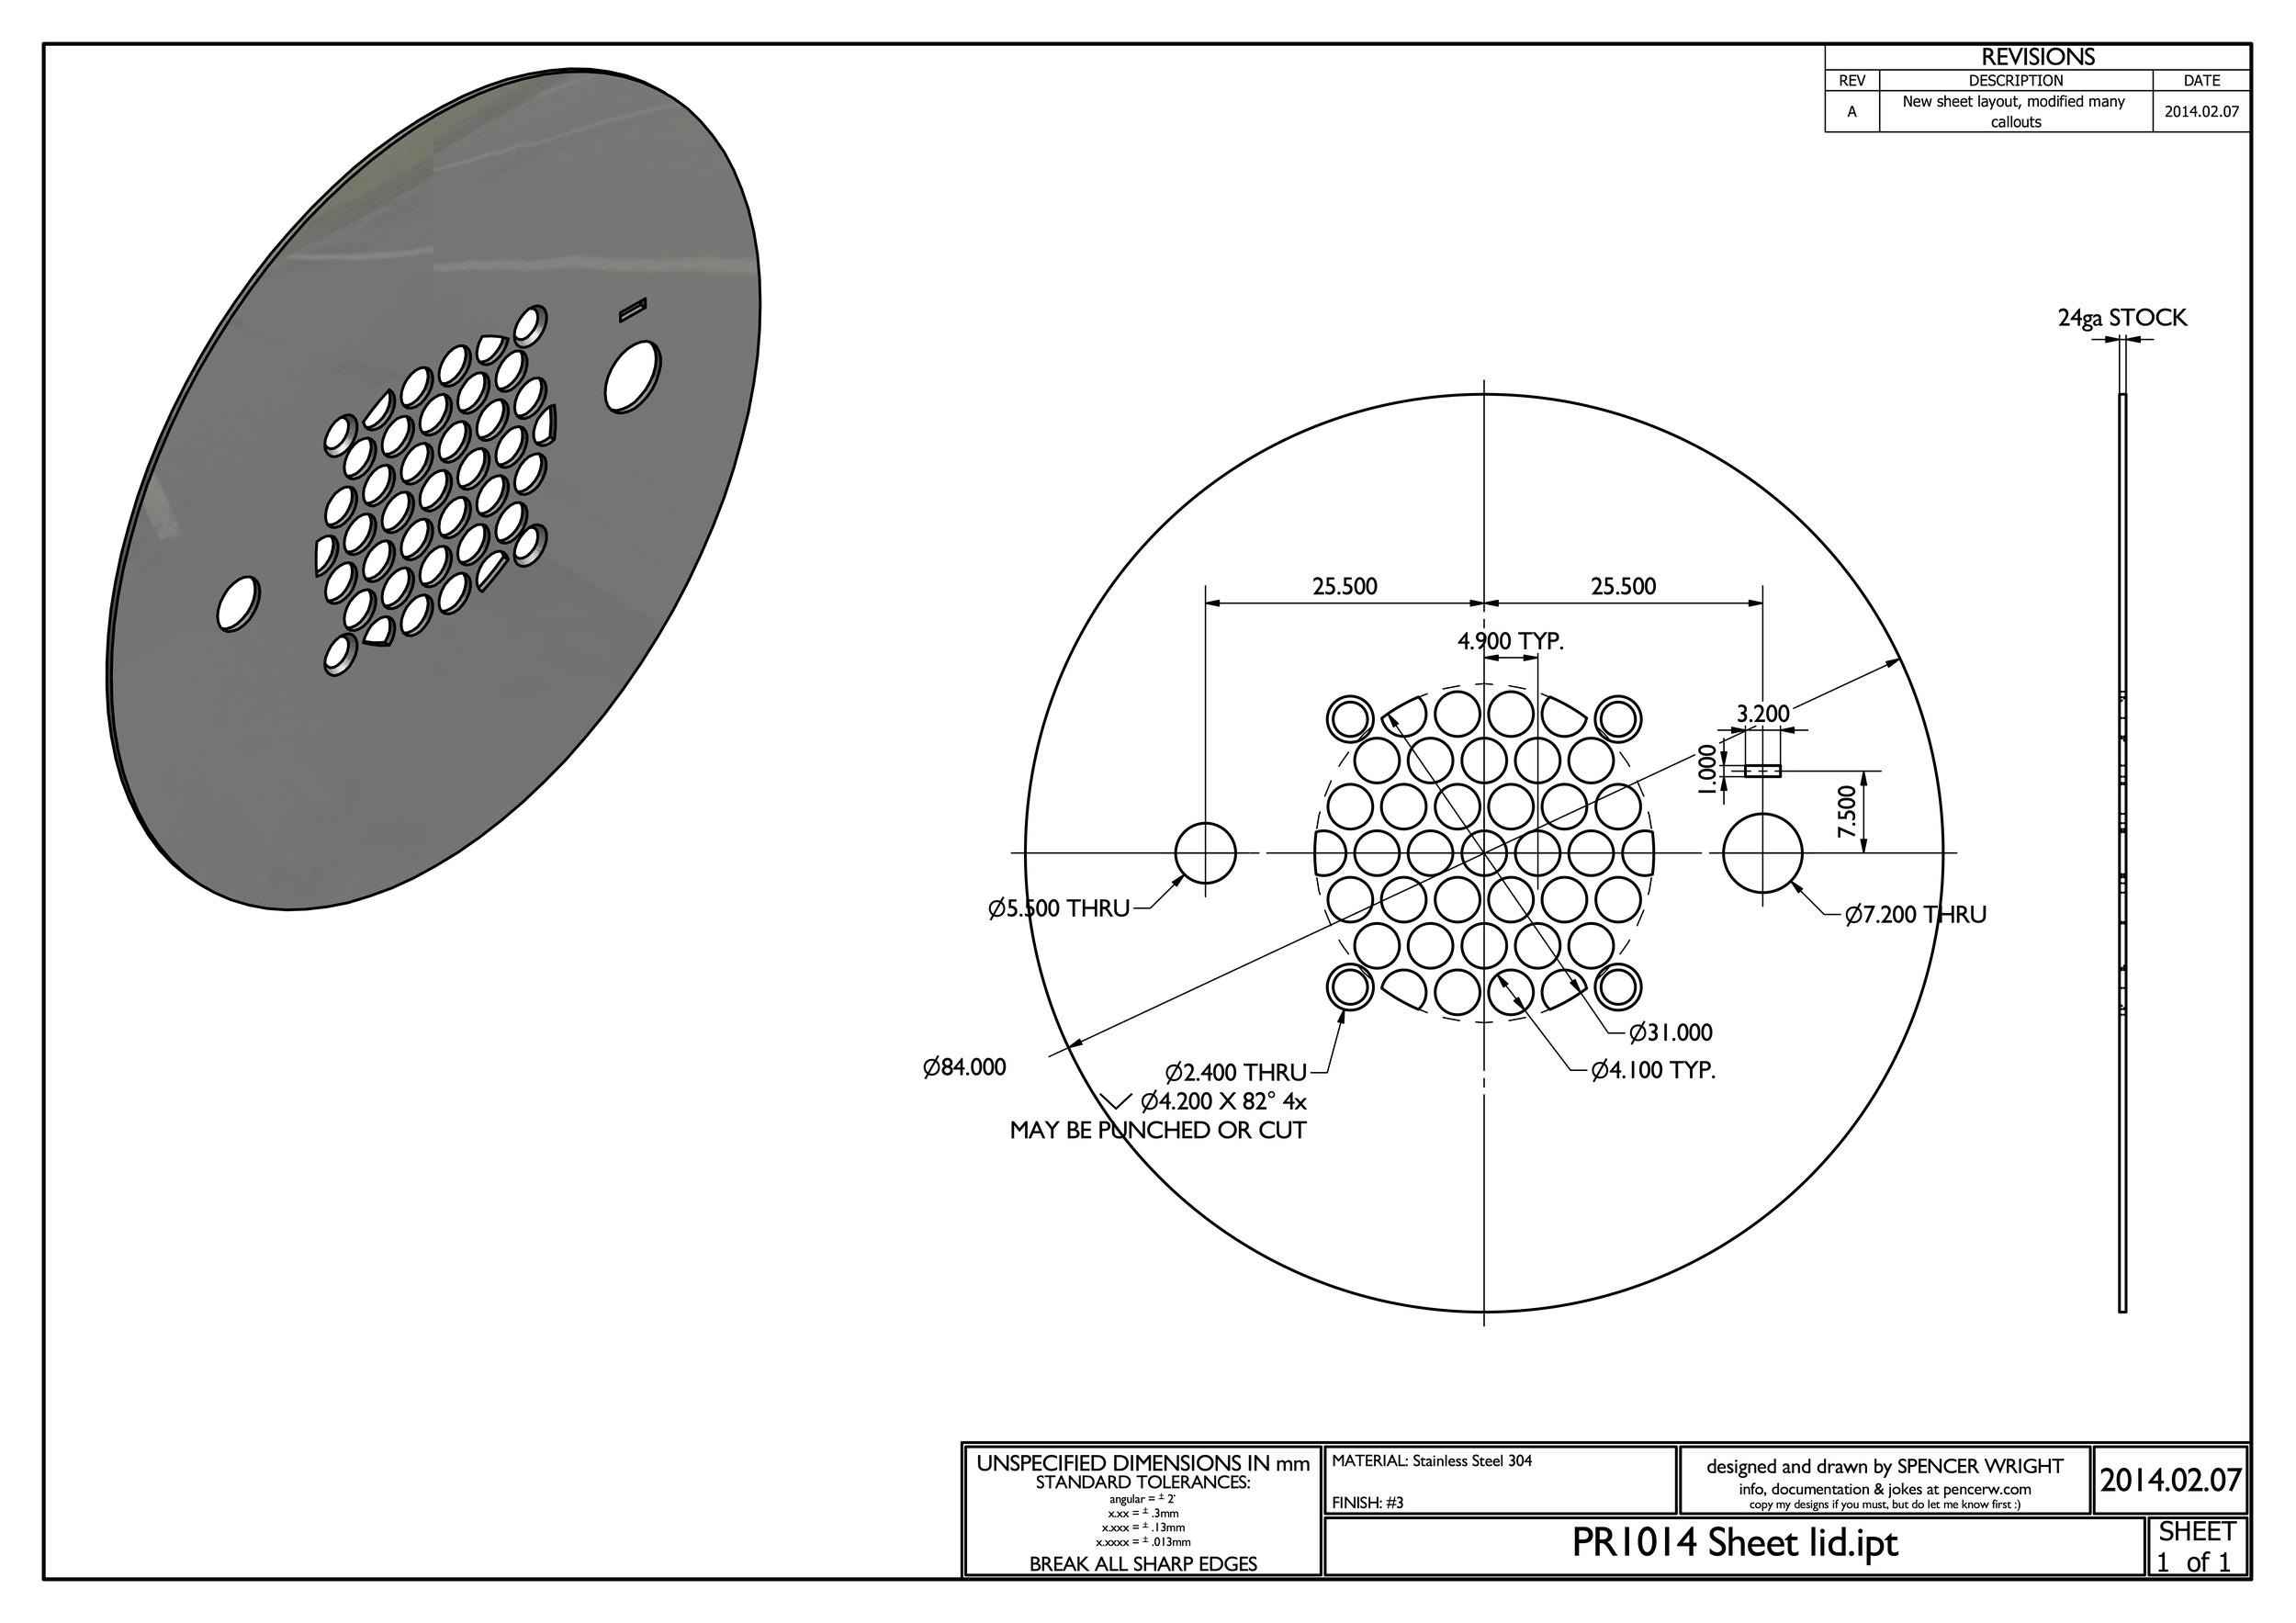 PR1014 Sheet lid REV A.jpg